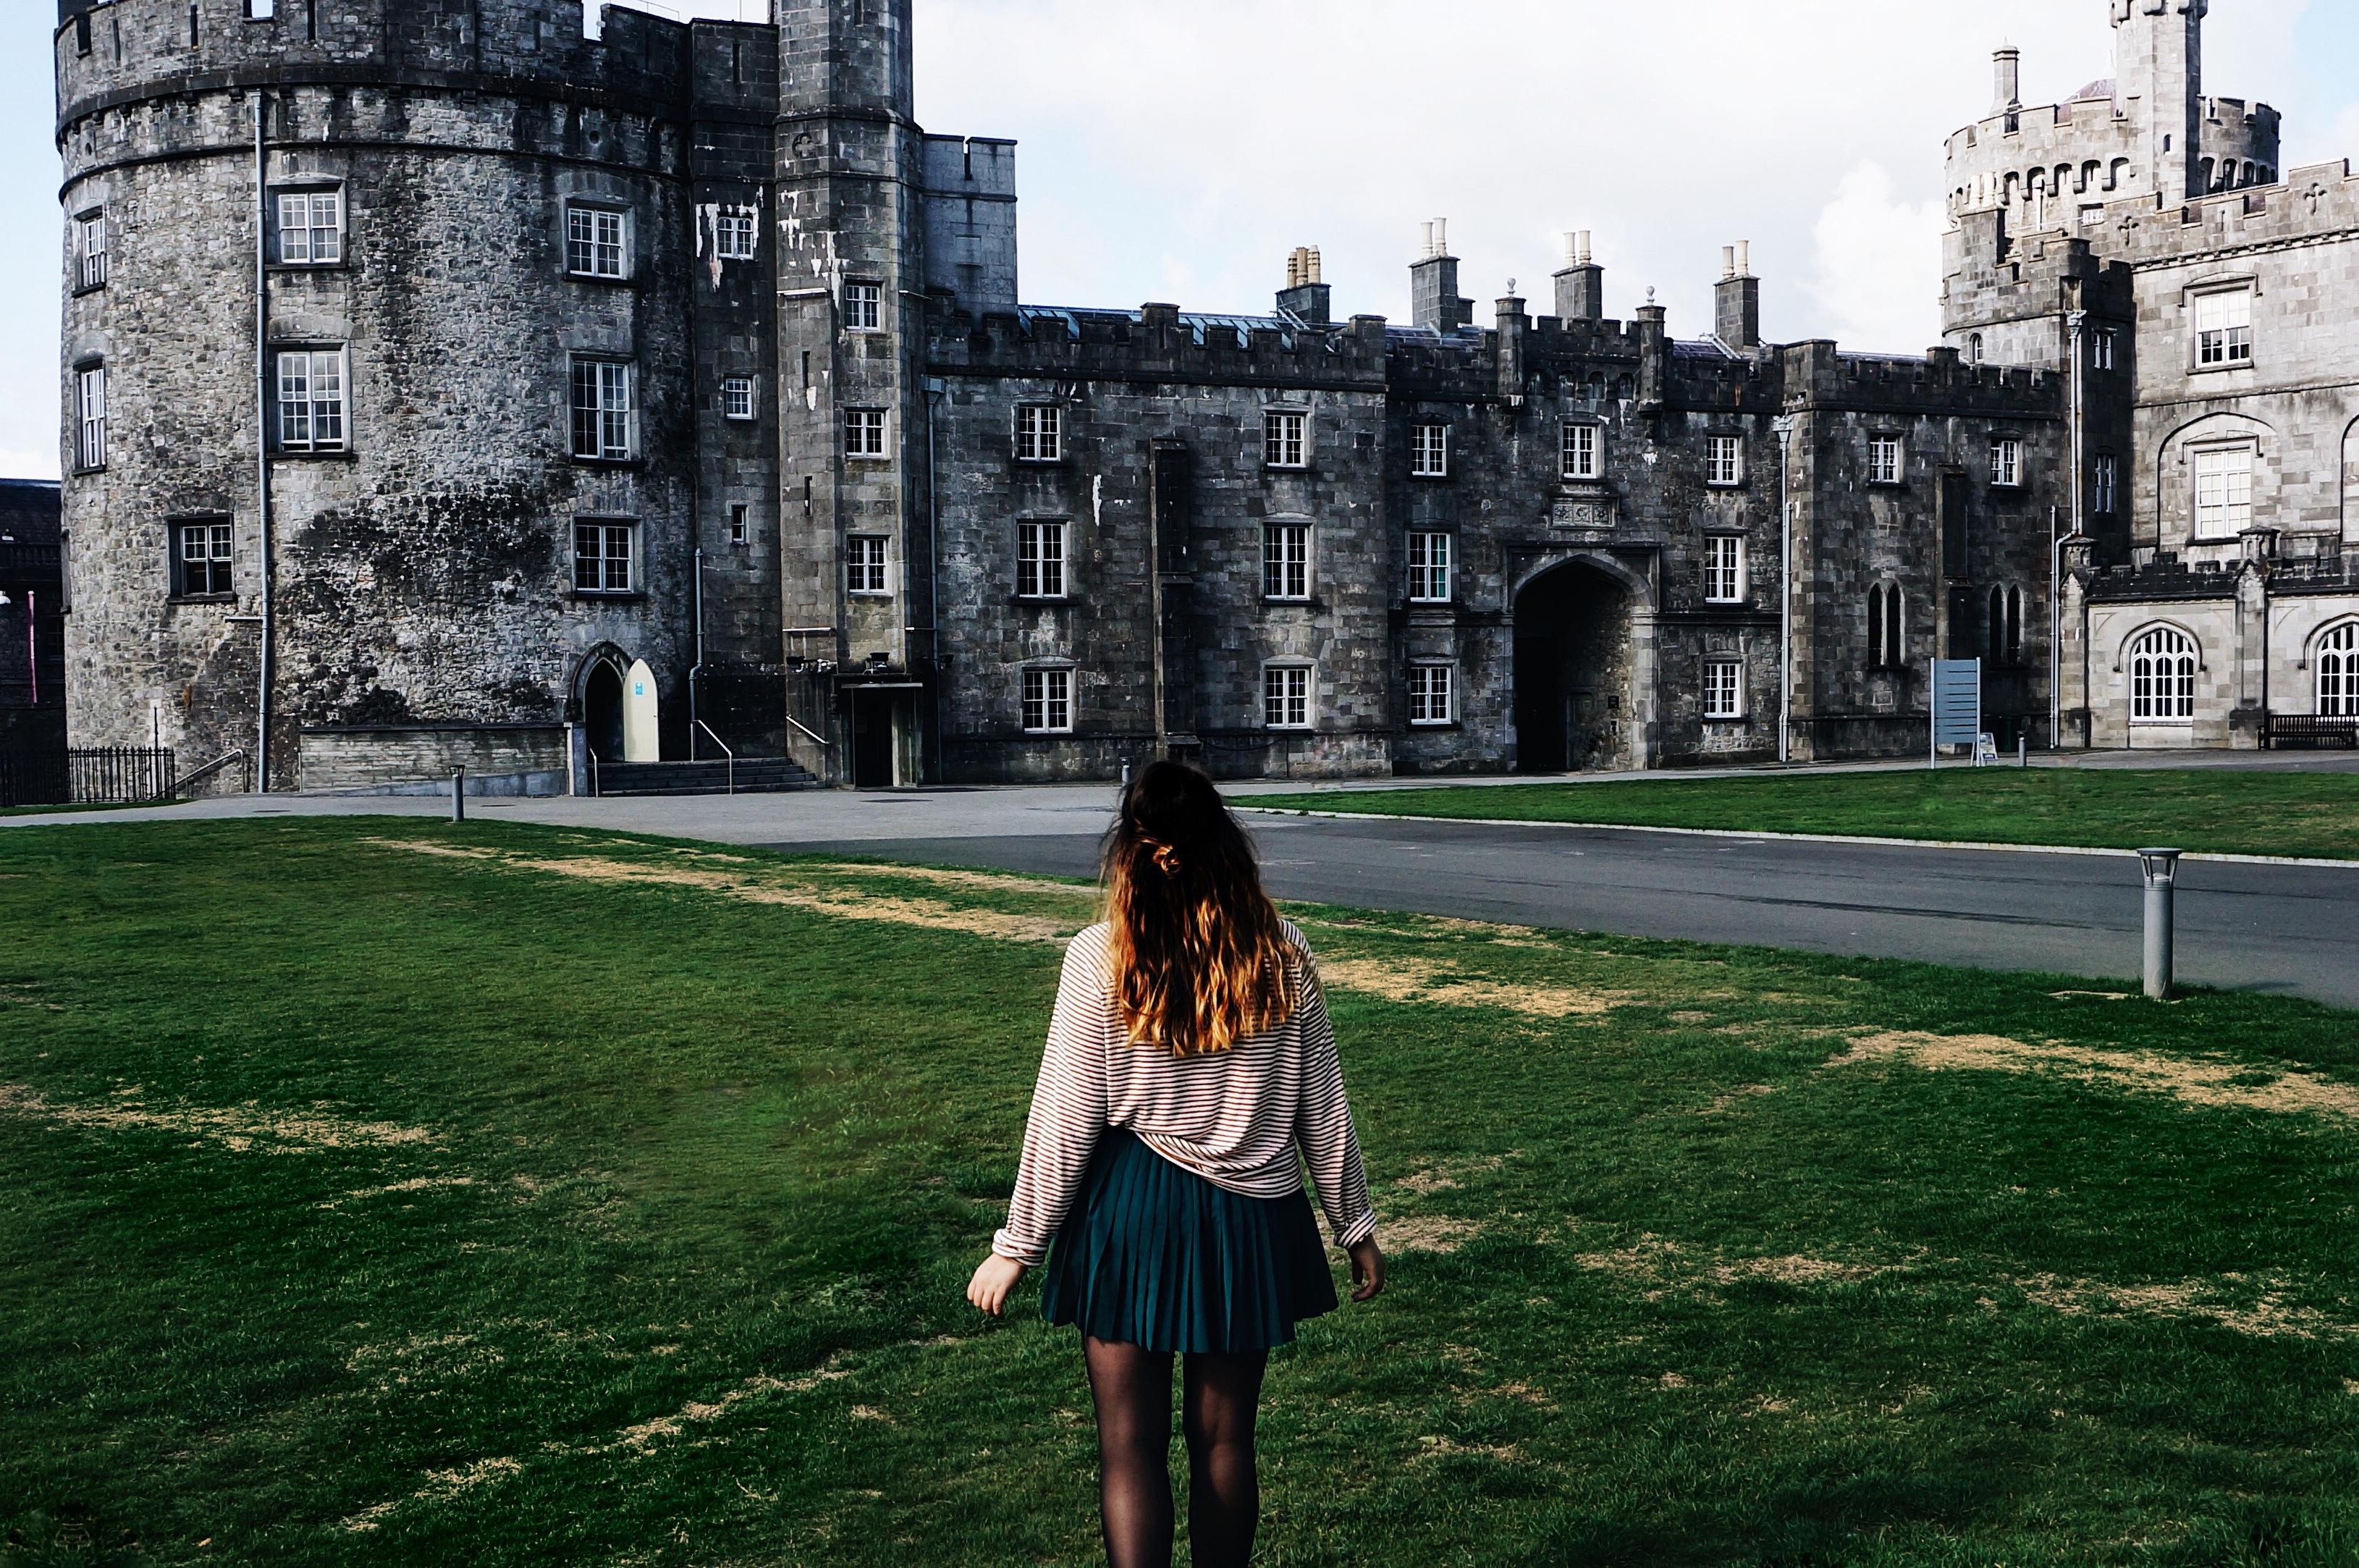 Irland Kilkenny Castle schloss urlaub Rundreise Städtetrip